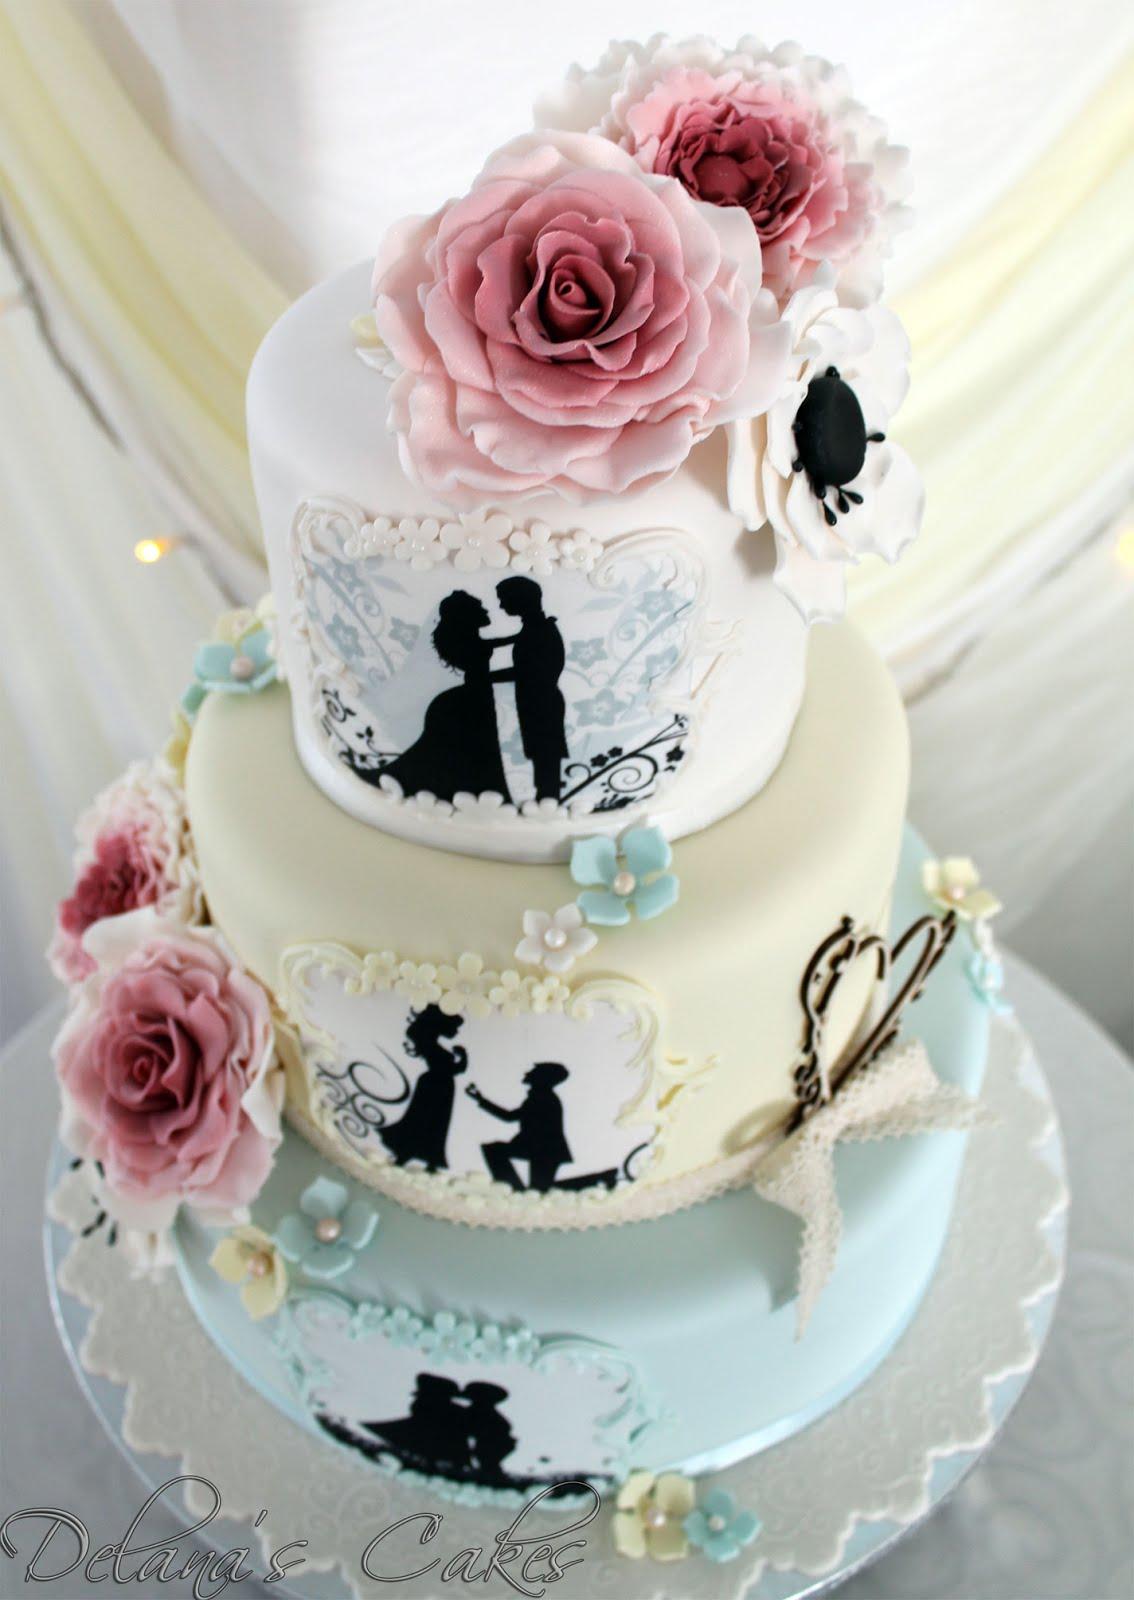 Delana S Cakes Romantic Love Story Wedding Cake